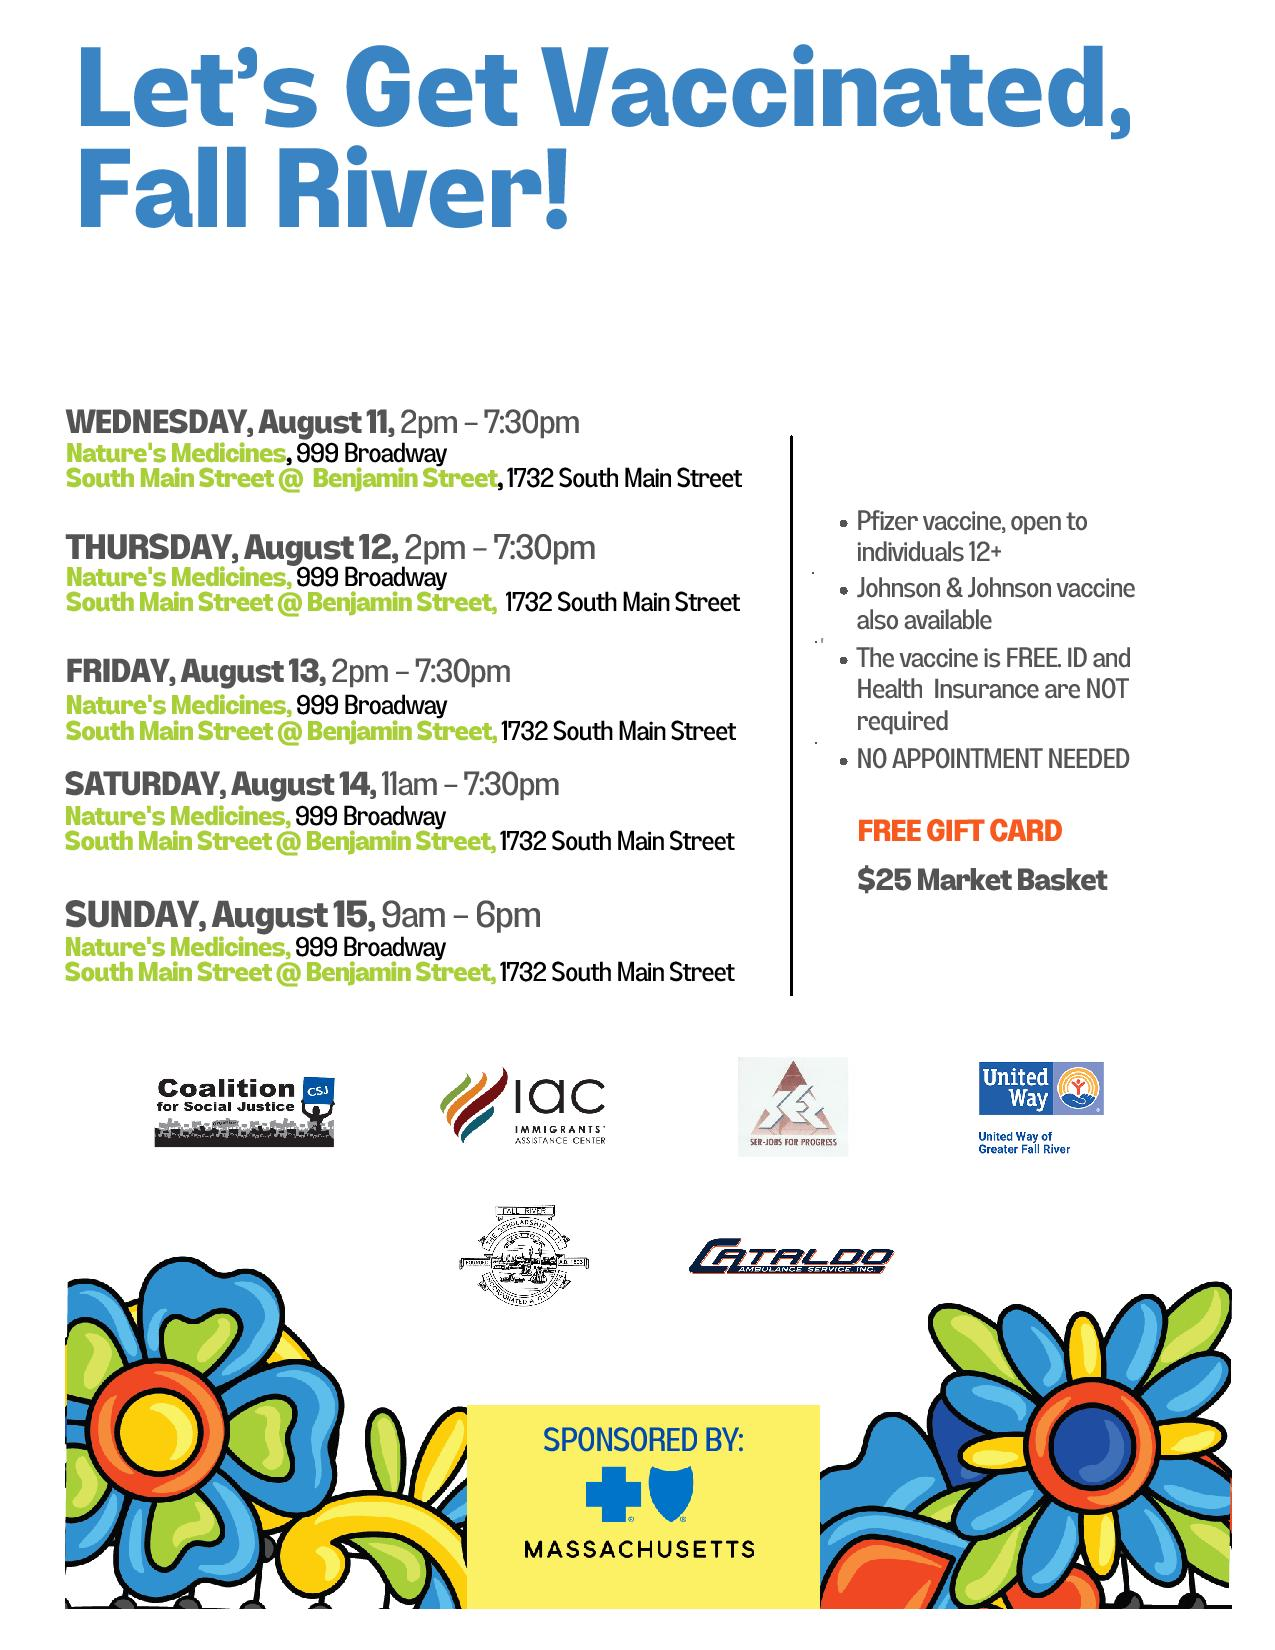 Vaccinate Fall River